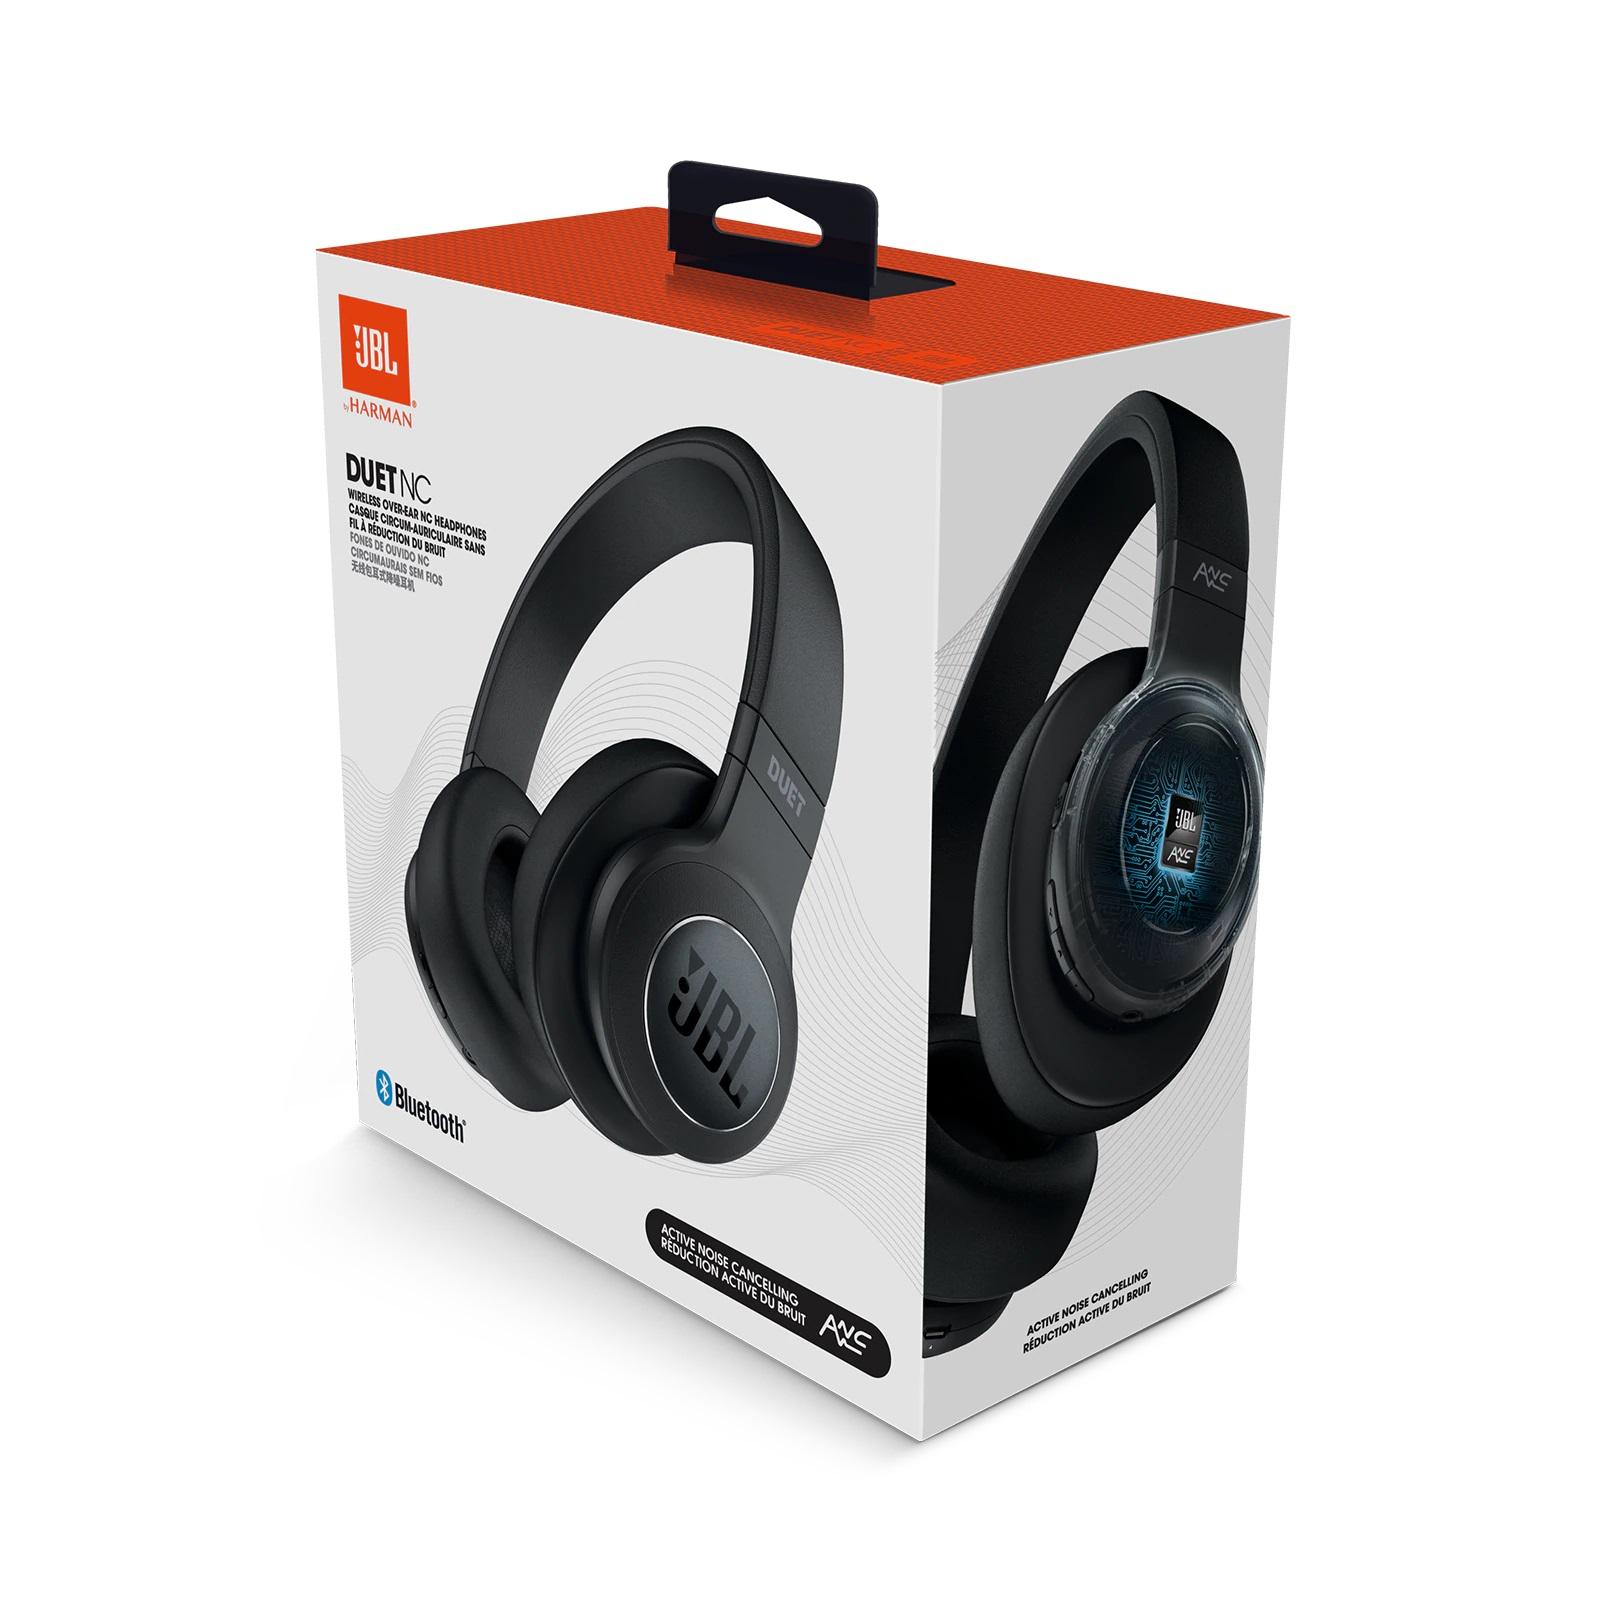 c07d77fc921 JBL Duet NC | Wireless over-ear noise-cancelling headphones